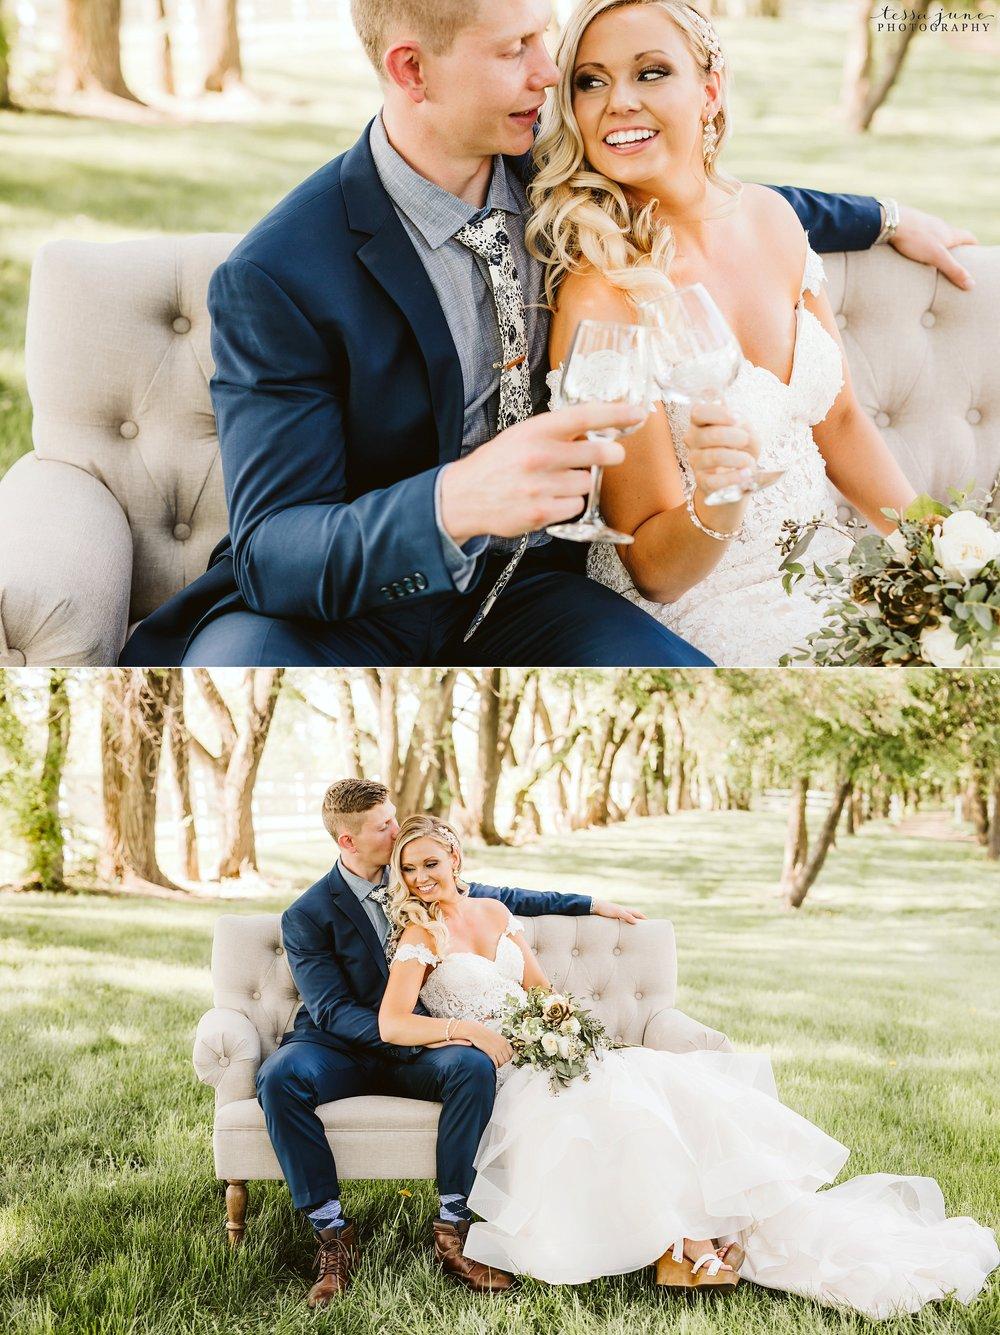 carlos-creek-winery-wedding-alexandria-minnesota-glam-elegant-floral-61.jpg